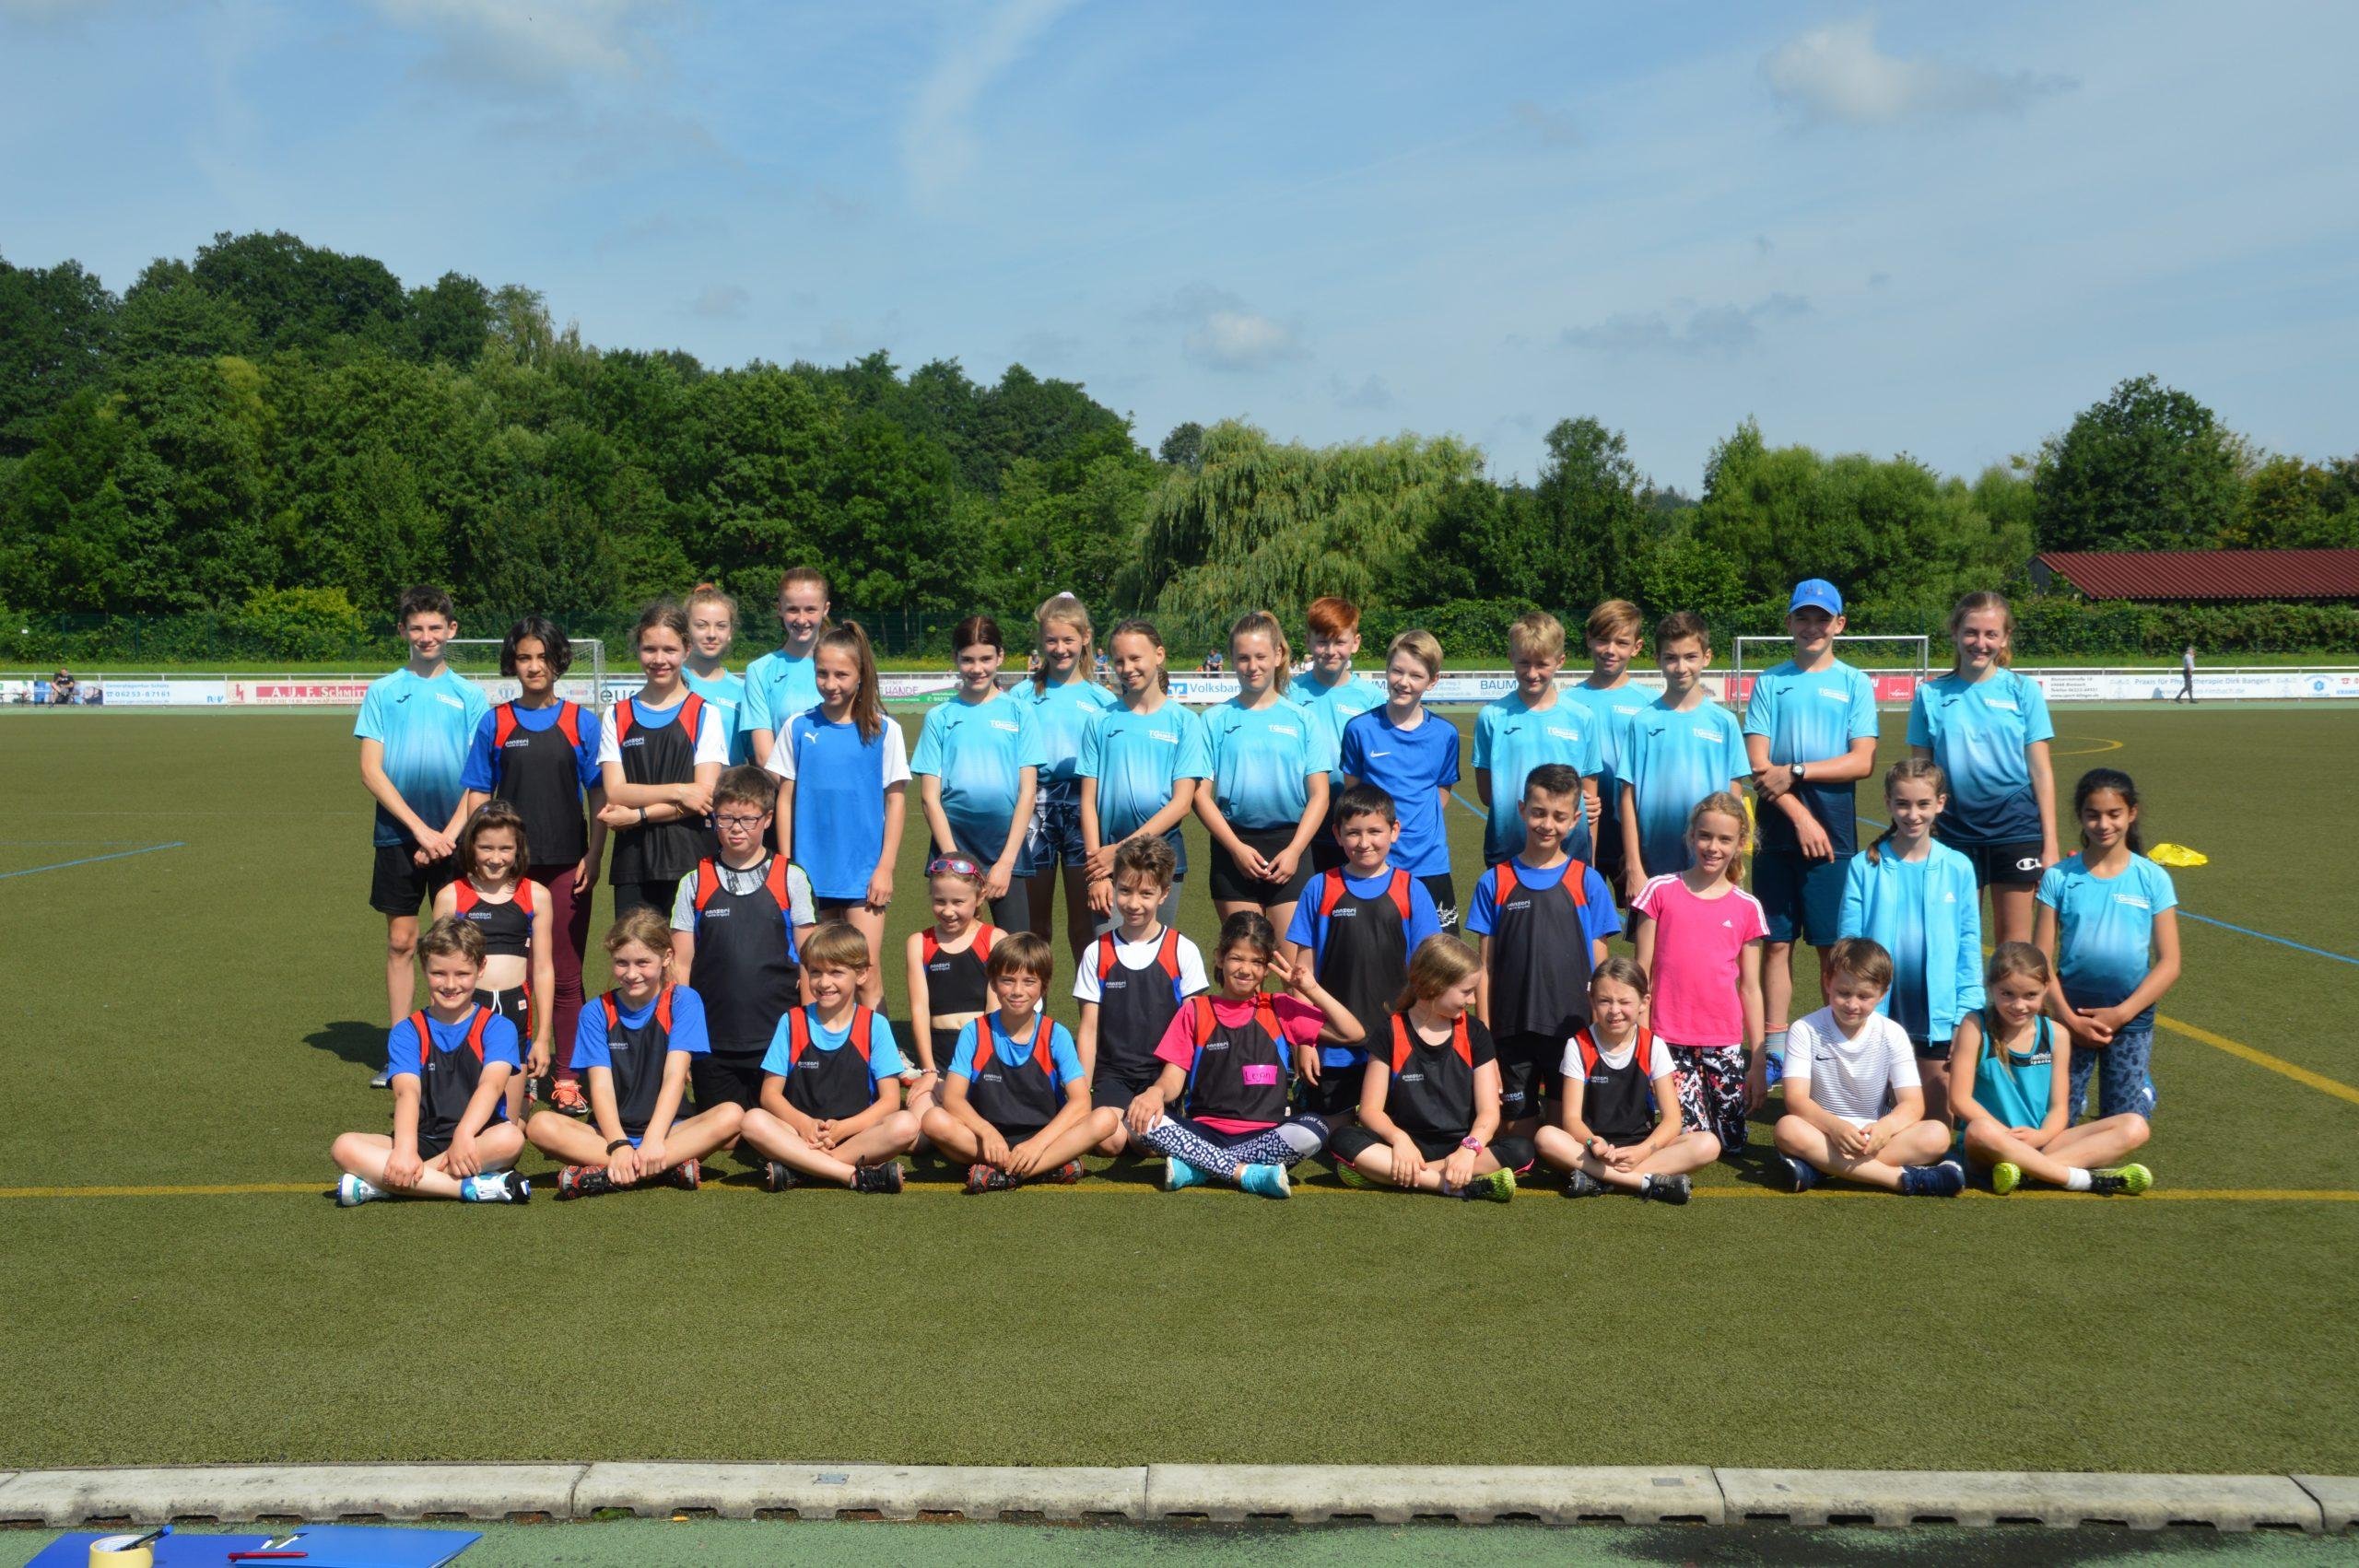 Wettkampf im Juli in Rimbach 2021